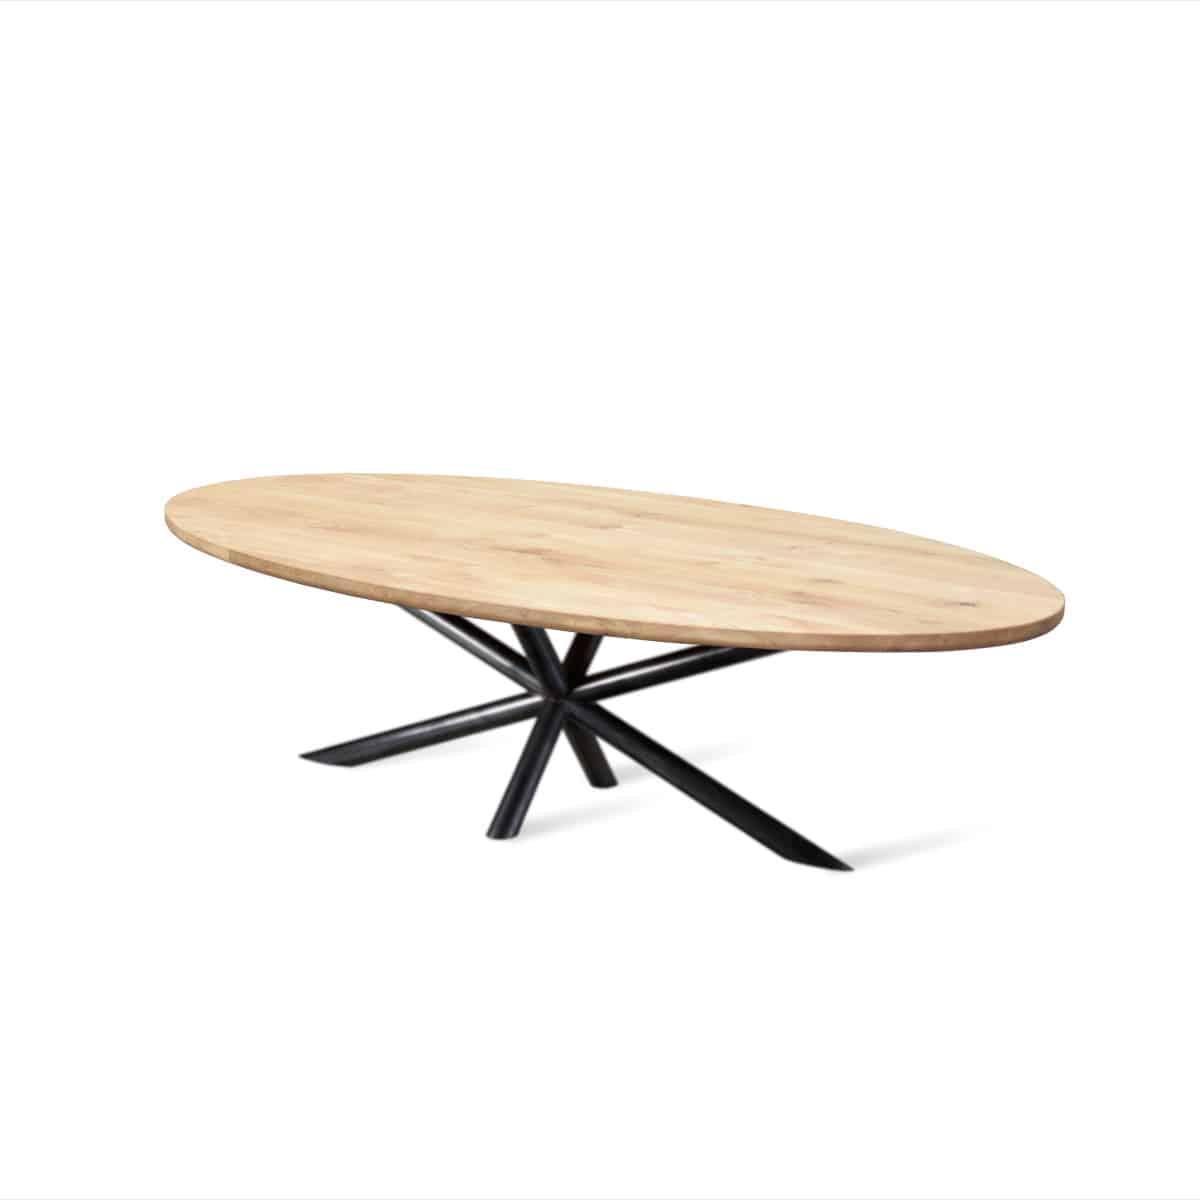 ovale ovaal Massief eiken houten boomstam eetkamer tafel eettafel keuken meubelmaker Friesland